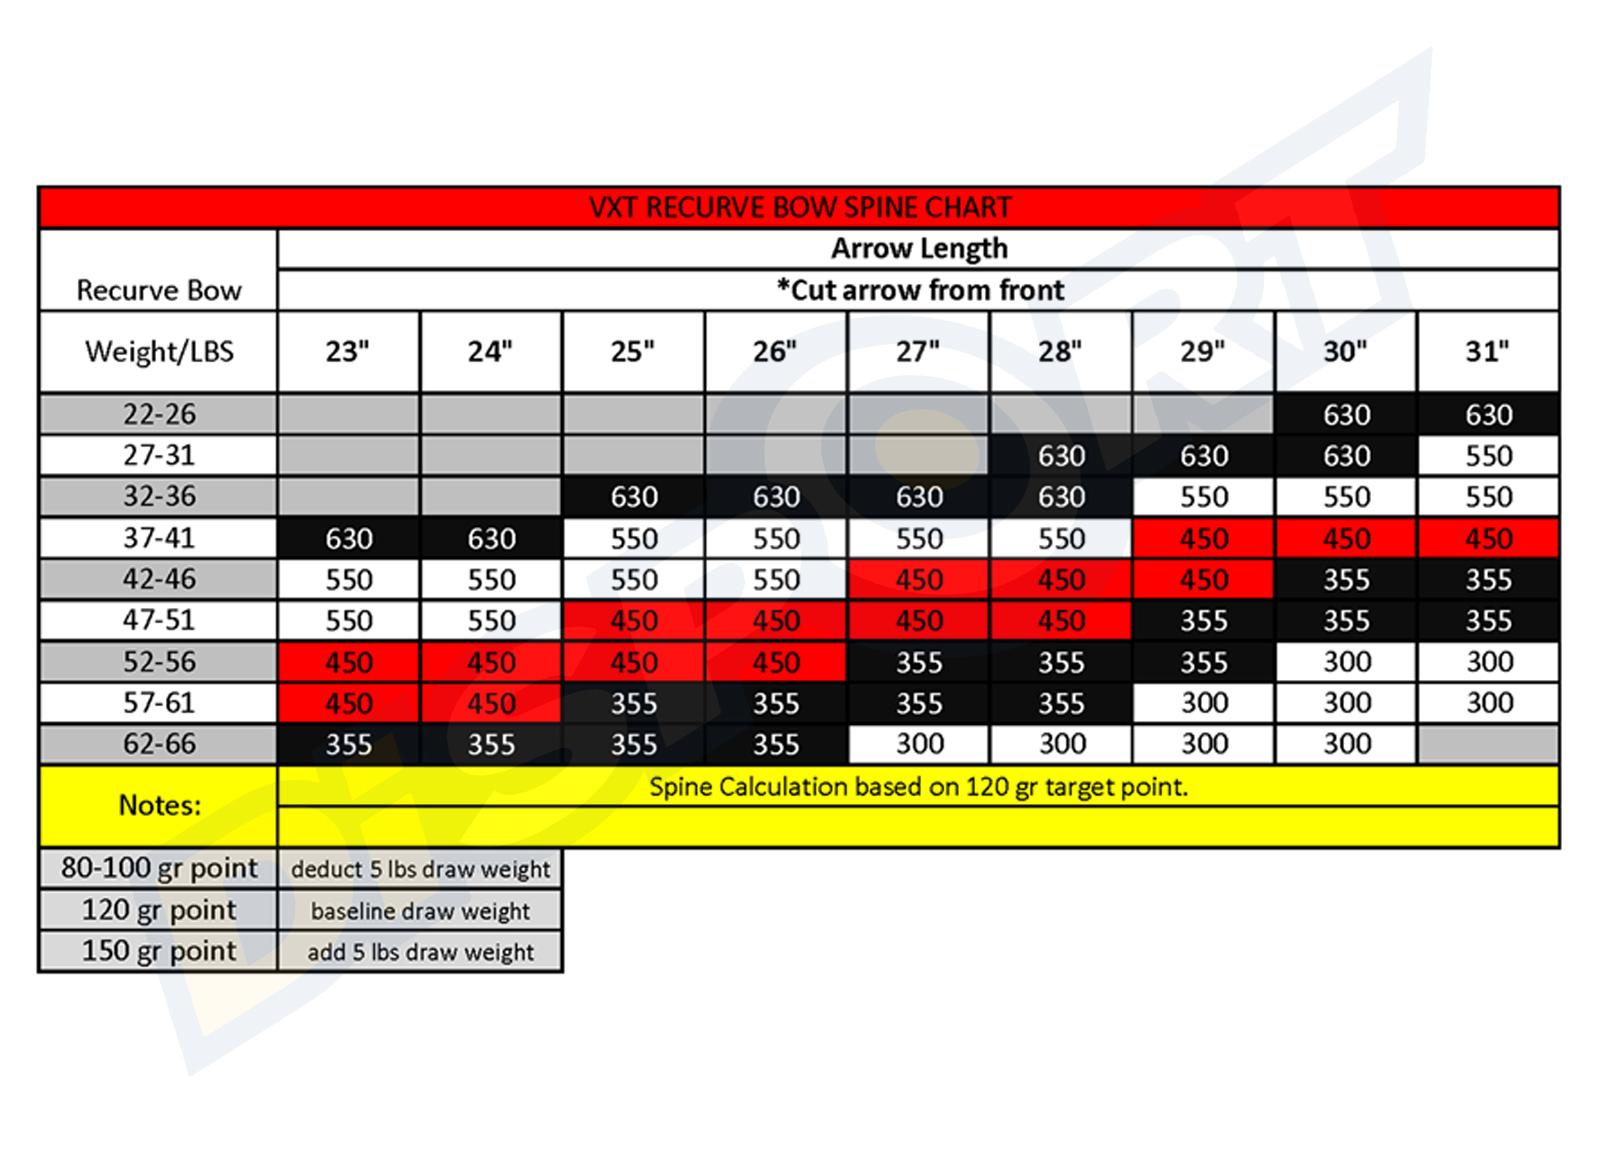 VICTORY ASTA CARBON VXT SPORT V6 TAPER SET 12 PZ